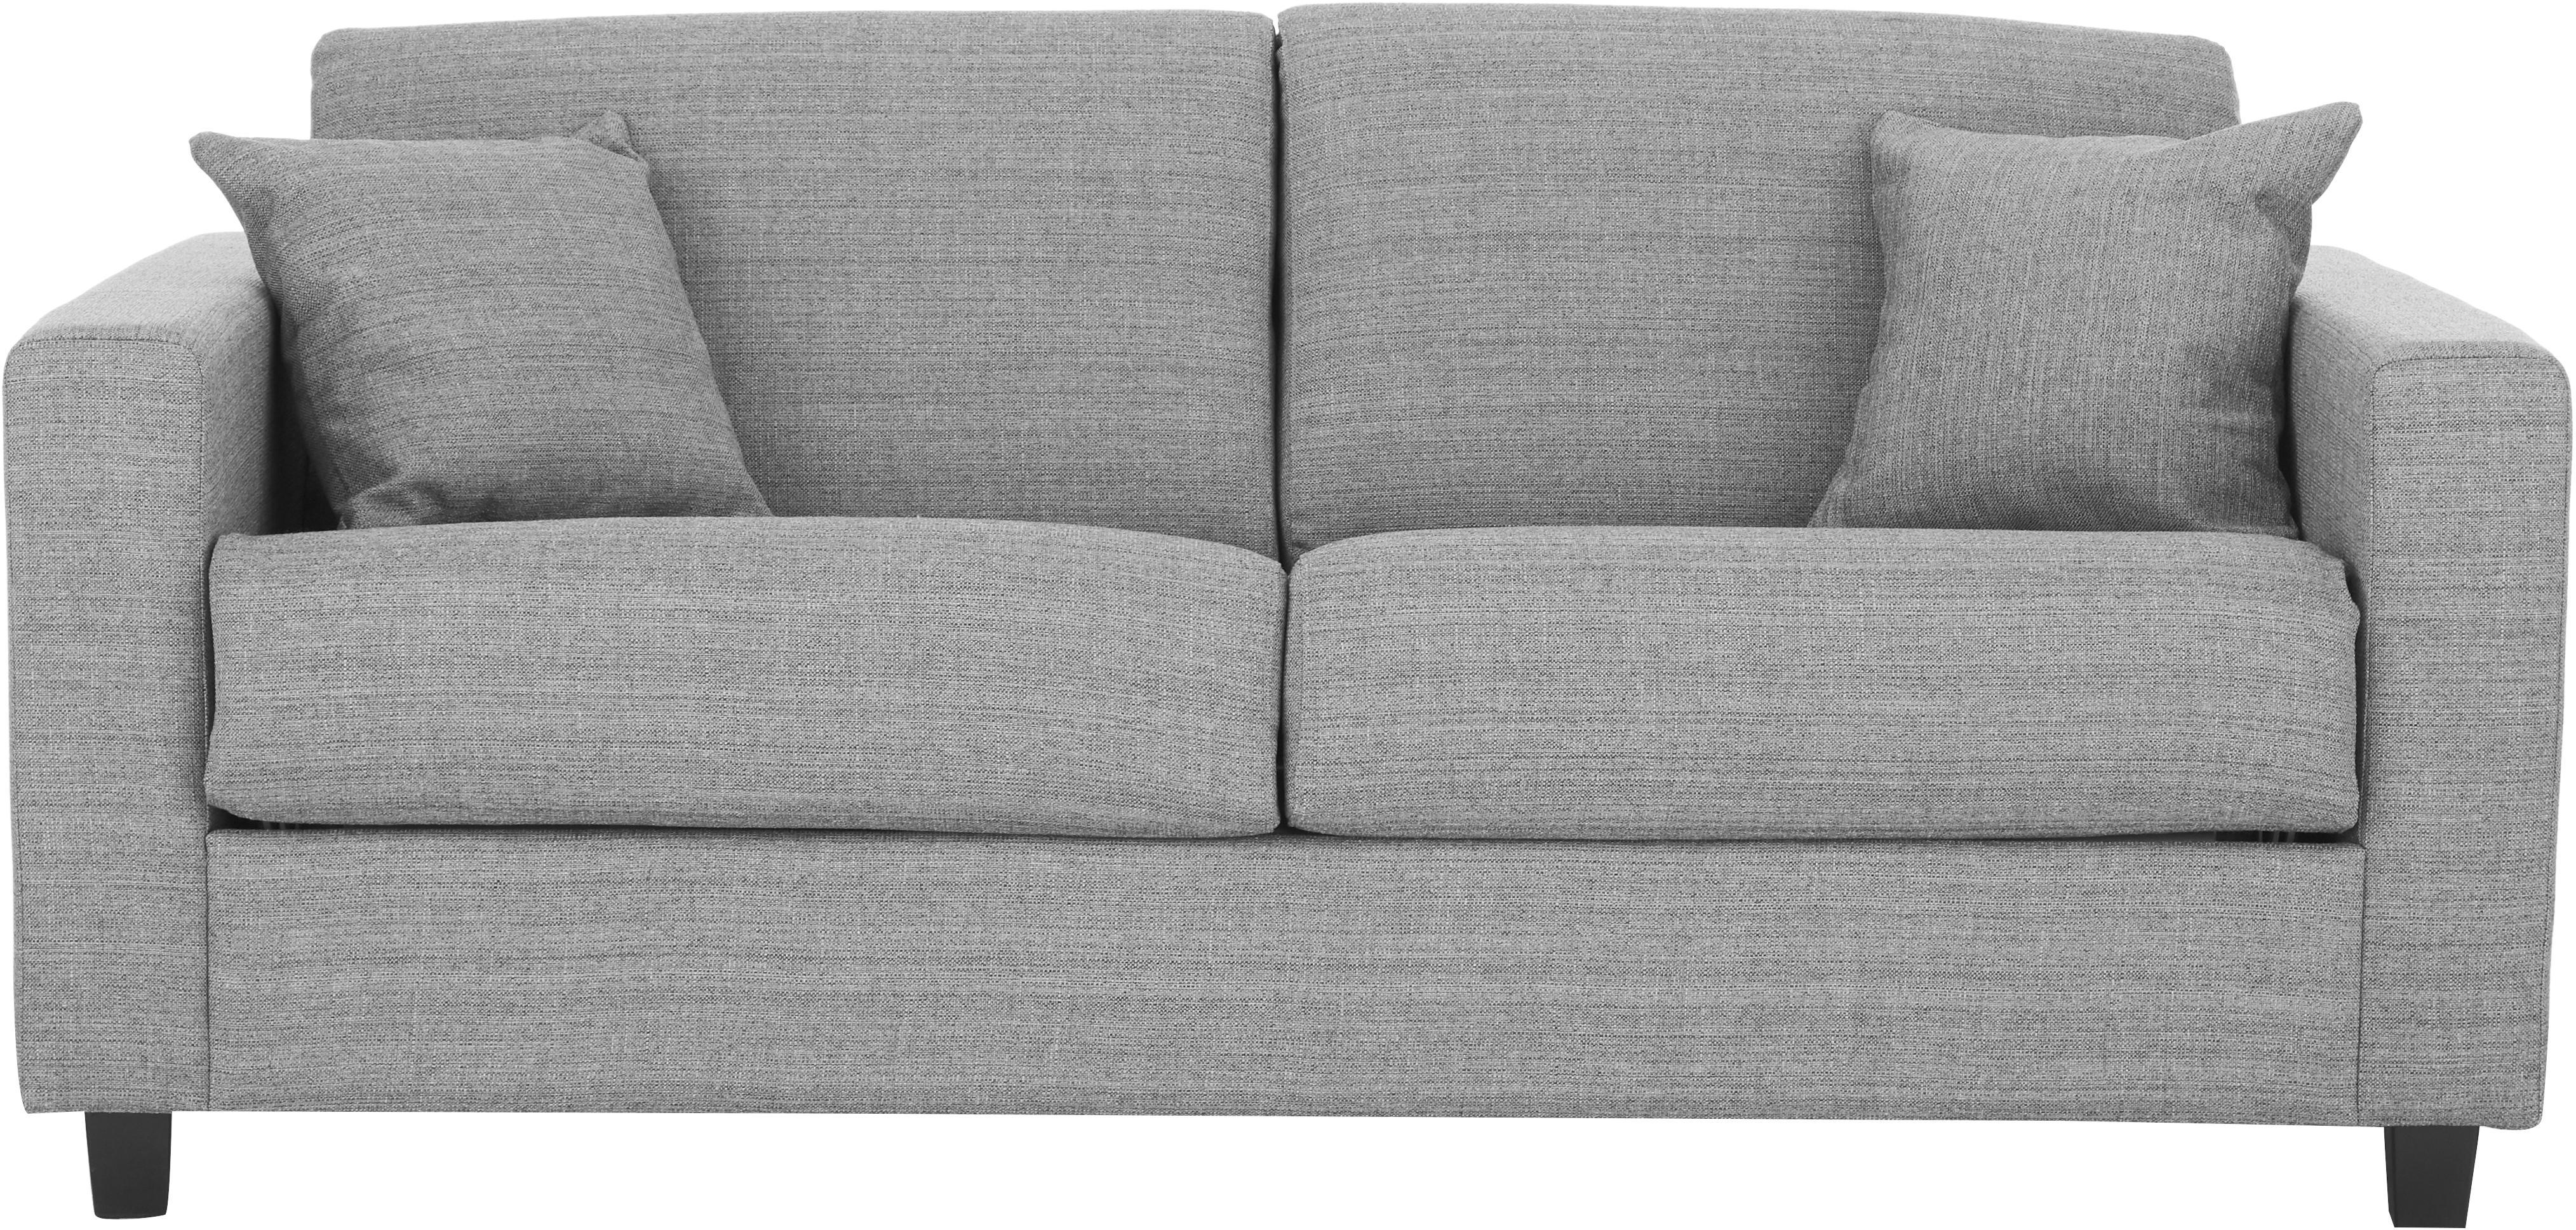 Sofá cama Maria, Tapizado: 40%algodón, 20%lino, 20, Patas: plástico, Estructura: tablero de fibras de dens, Tejido gris claro, An 180 x F 102 cm